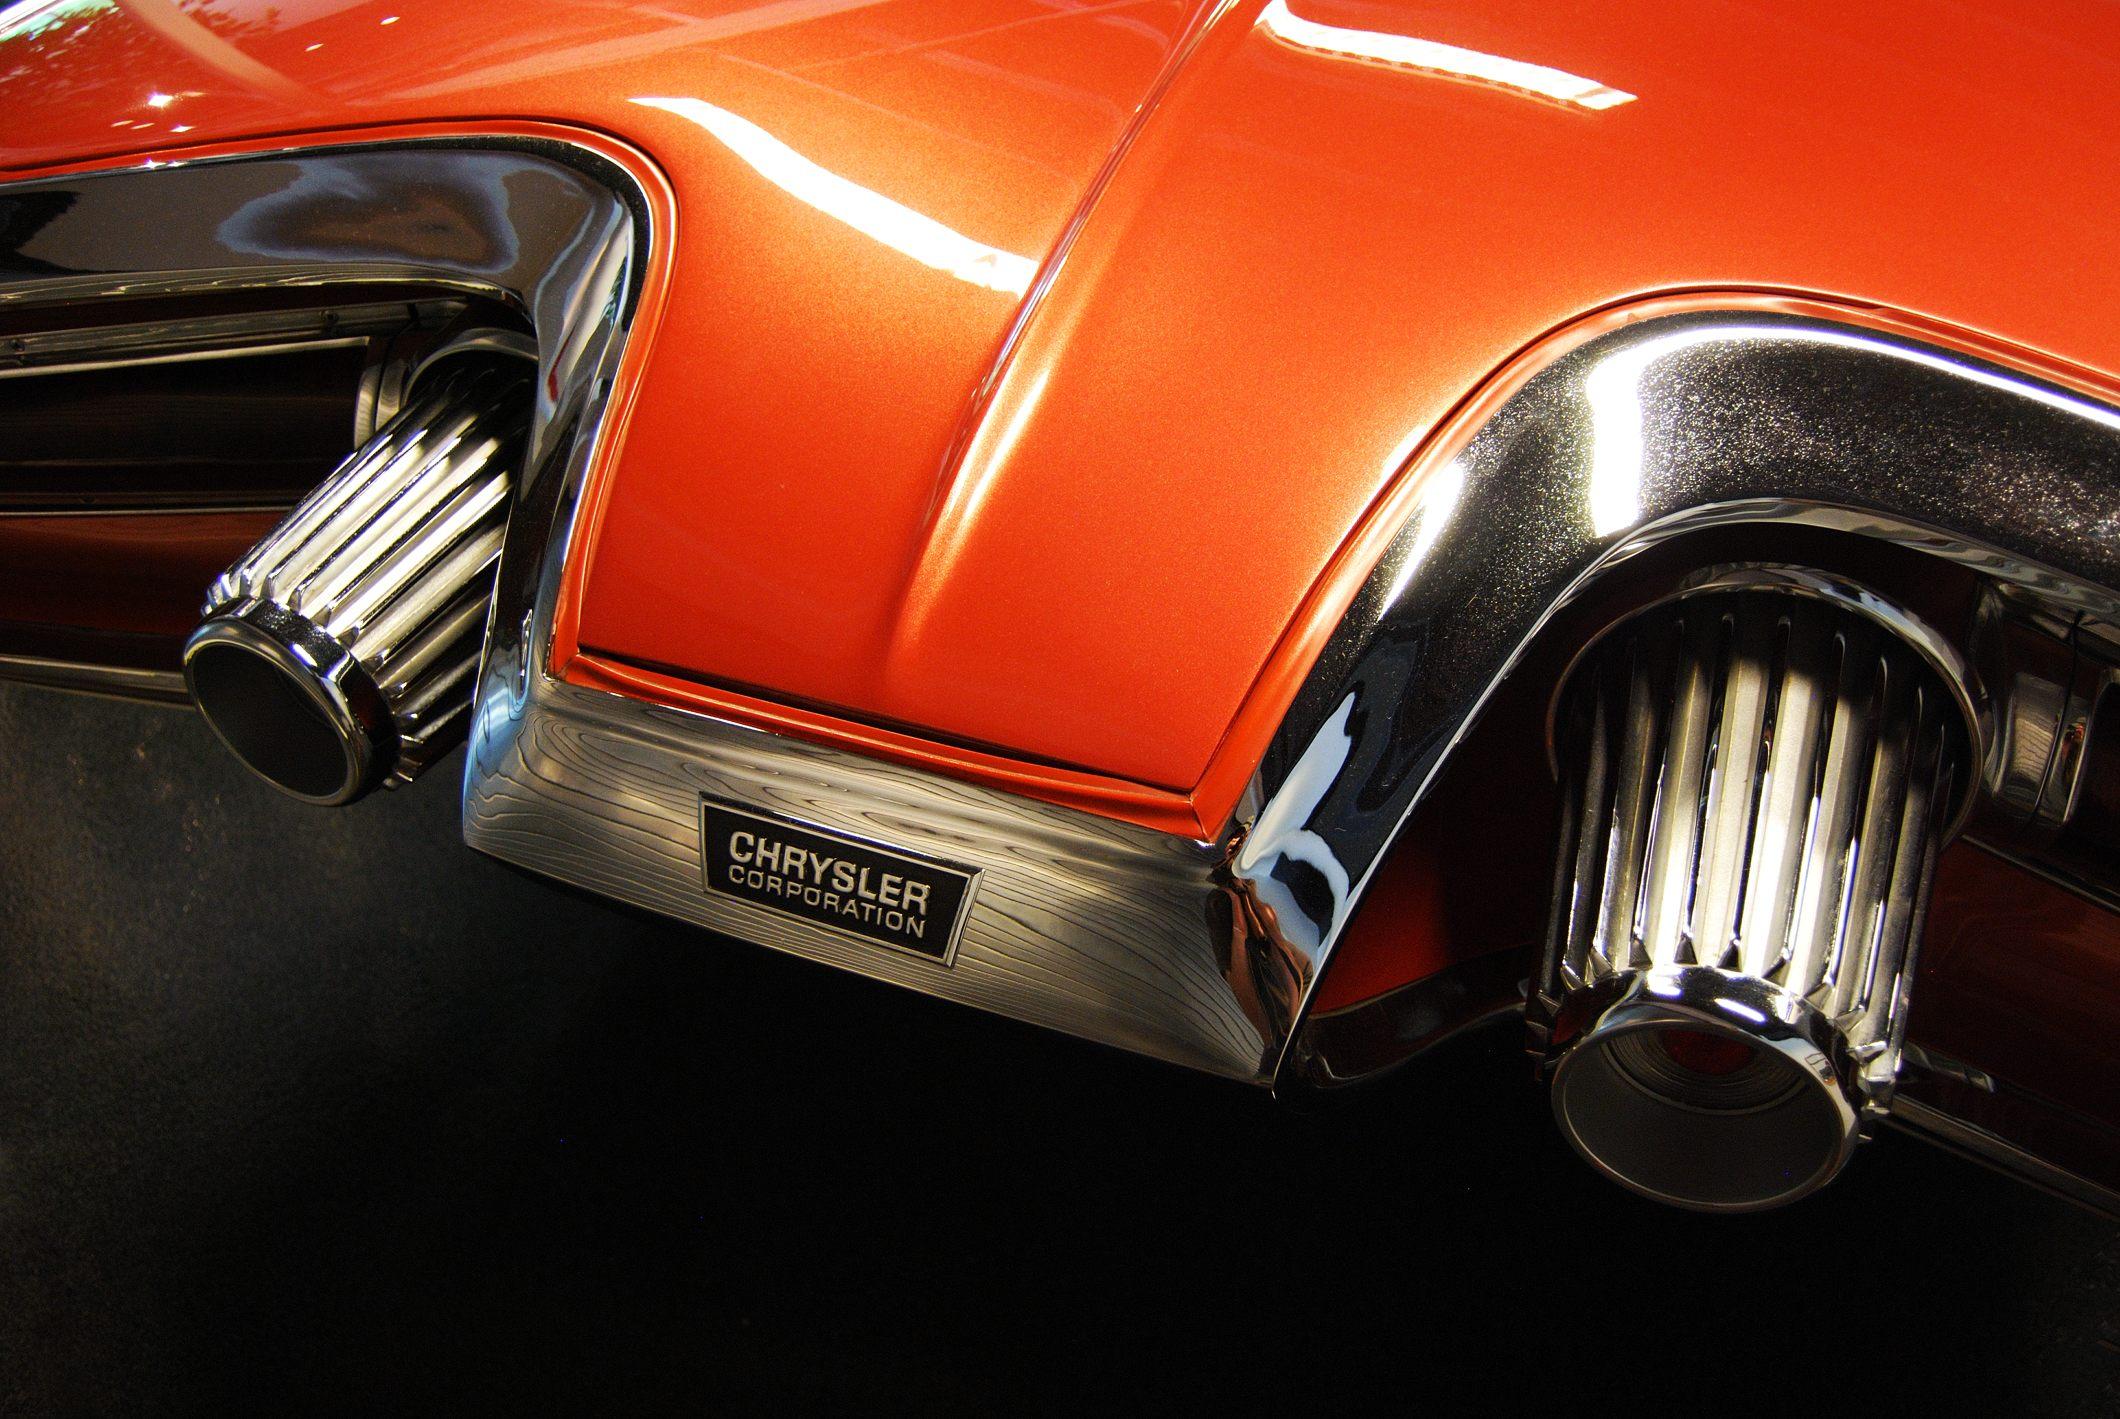 1963 Chrysler gas turbine car - rear light cluster